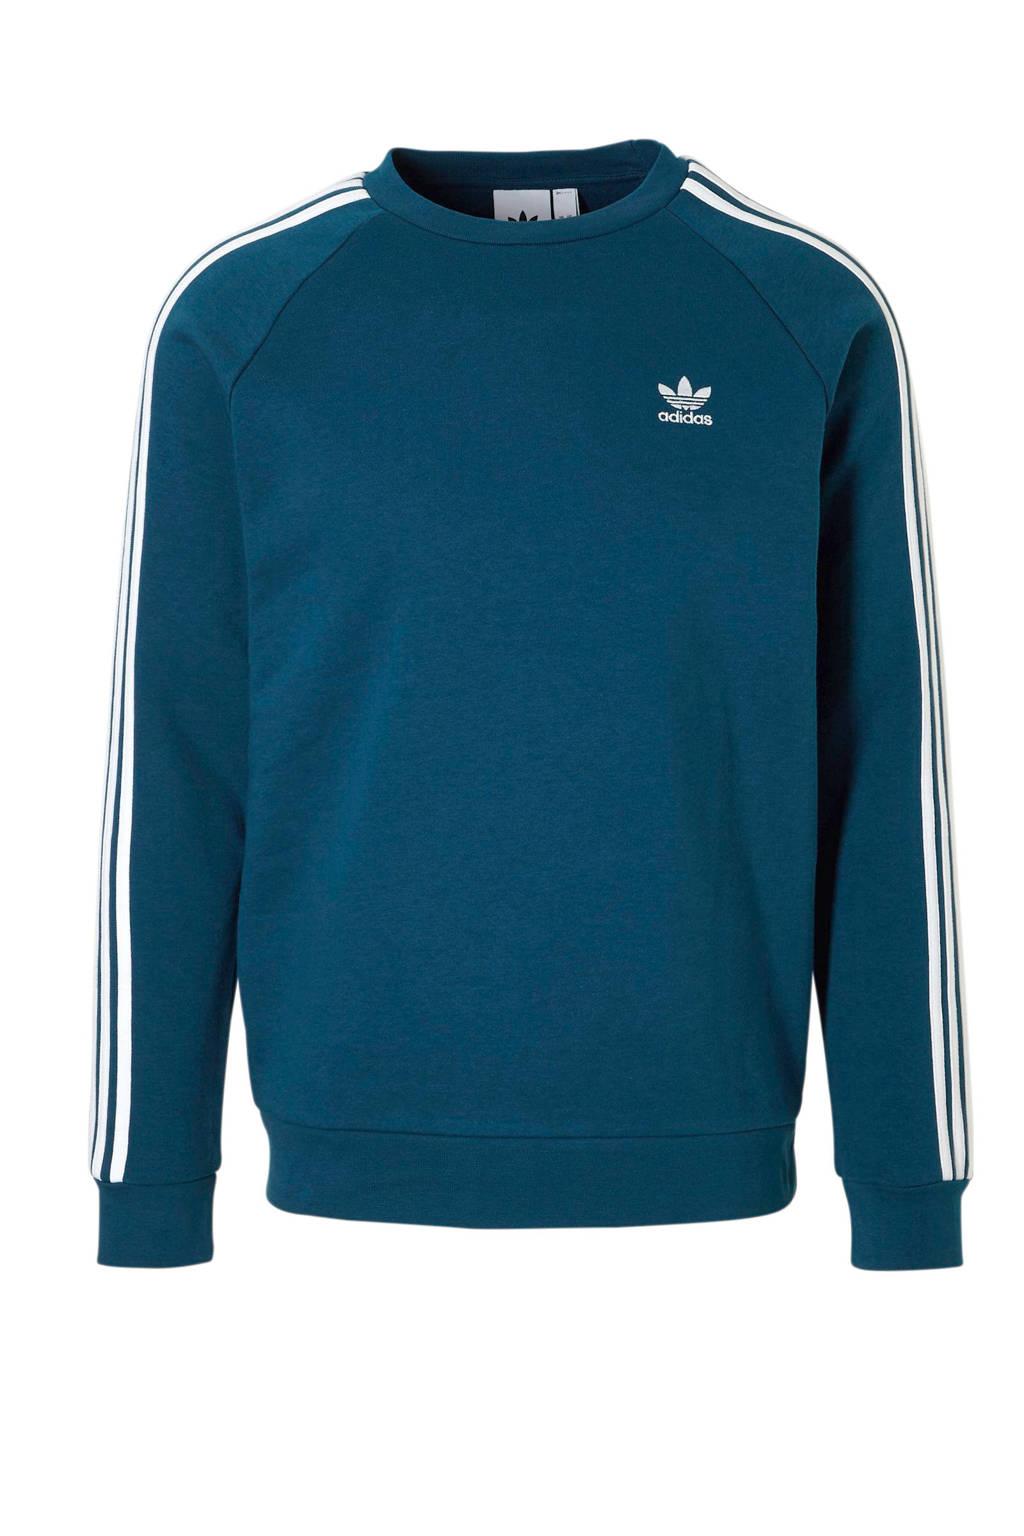 adidas originals   sweater petrol, Petrol/wit